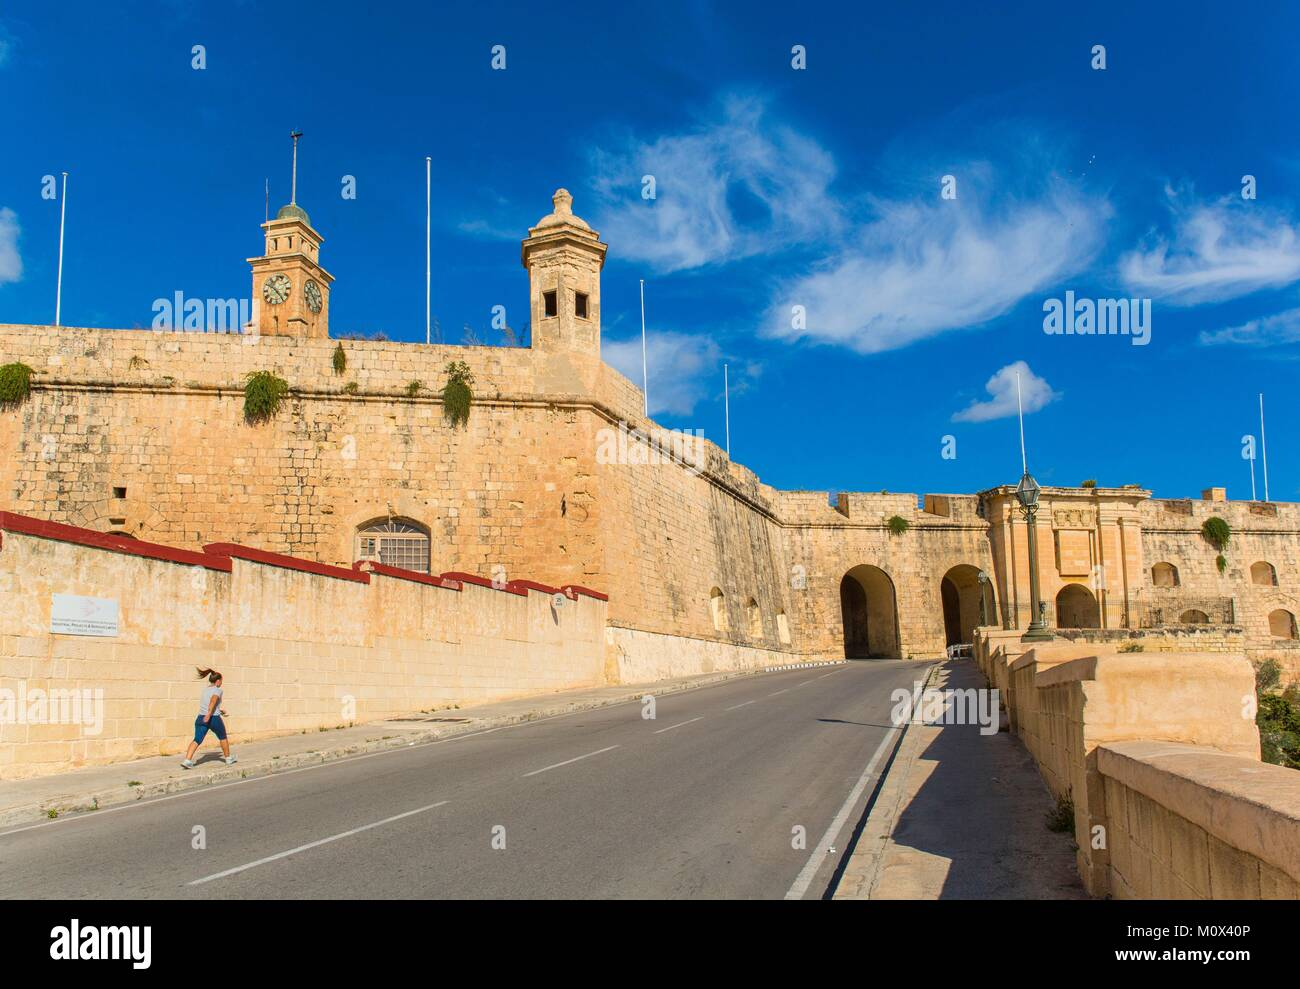 Malta,Valletta,listed as World Heritage by UNESCO,the Three Cities,Senglea Gate - Stock Image